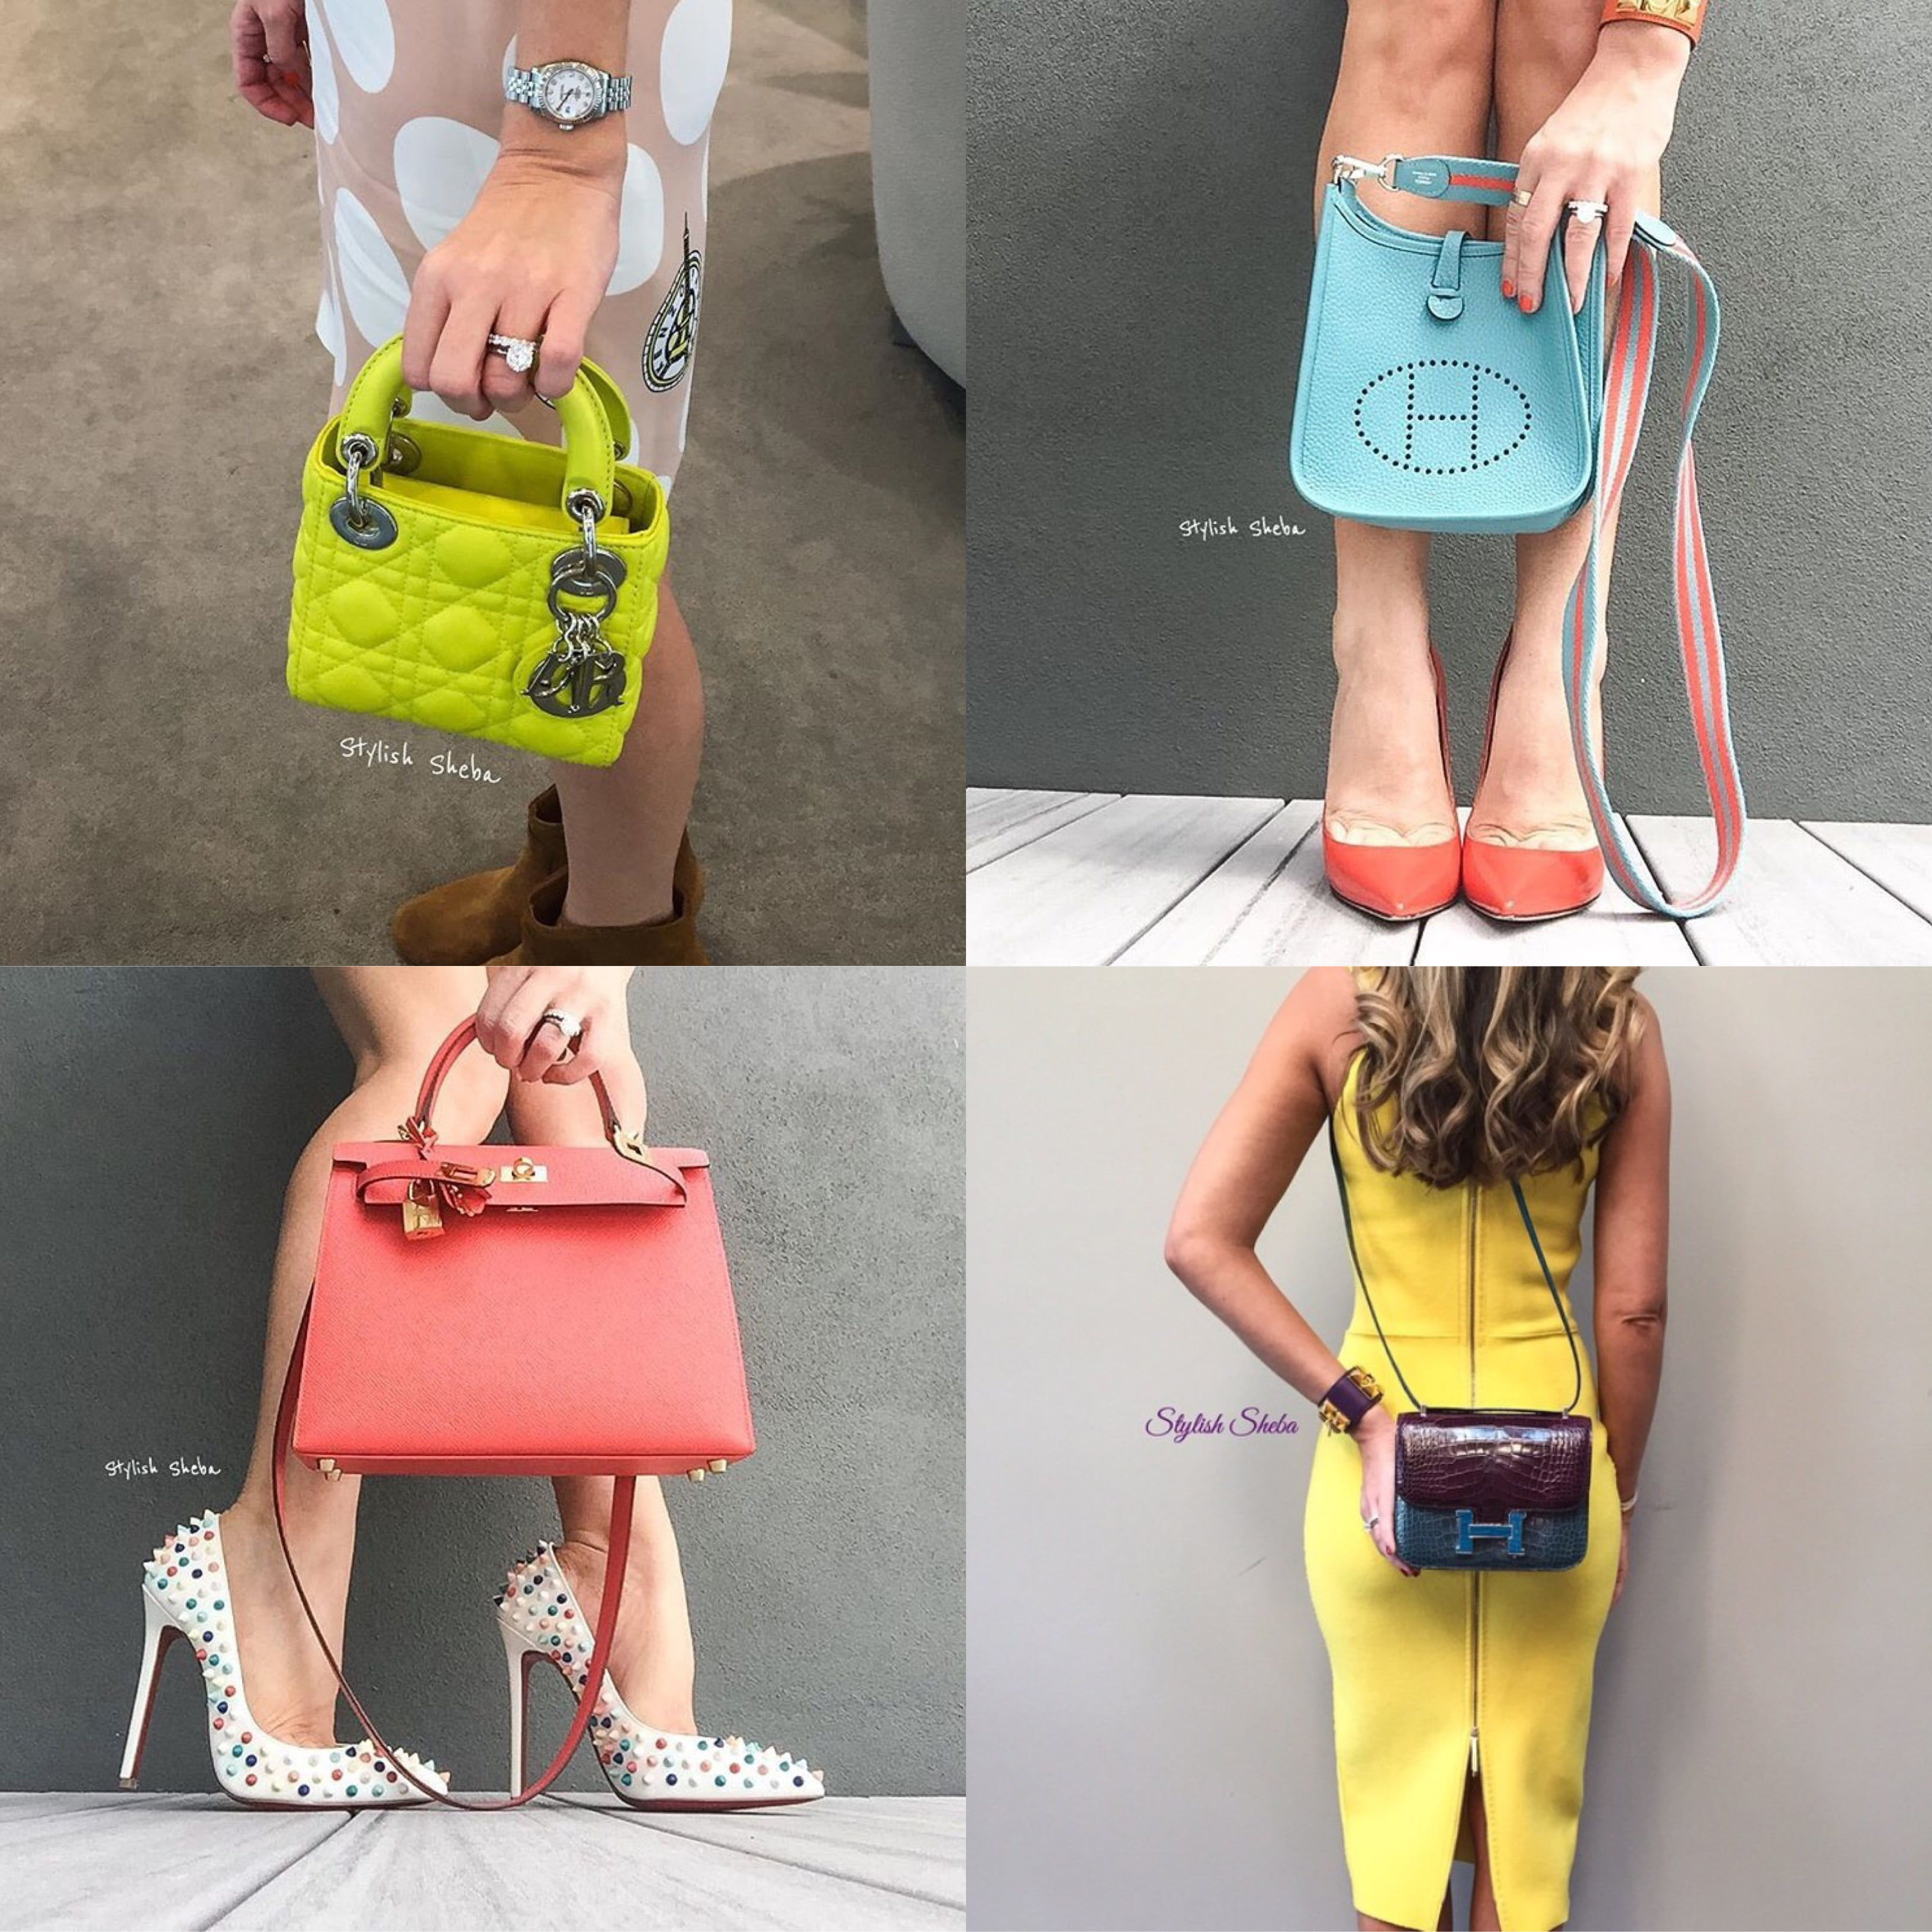 17cbf3c9b1 Mini Mood from BopTalk Celebrity Stylish Sheba. From left to right: Lady  Dior Mini, Hermes Evelyn Mini, Hermes Kelly 25 Mini, Hermes Constance Mini.